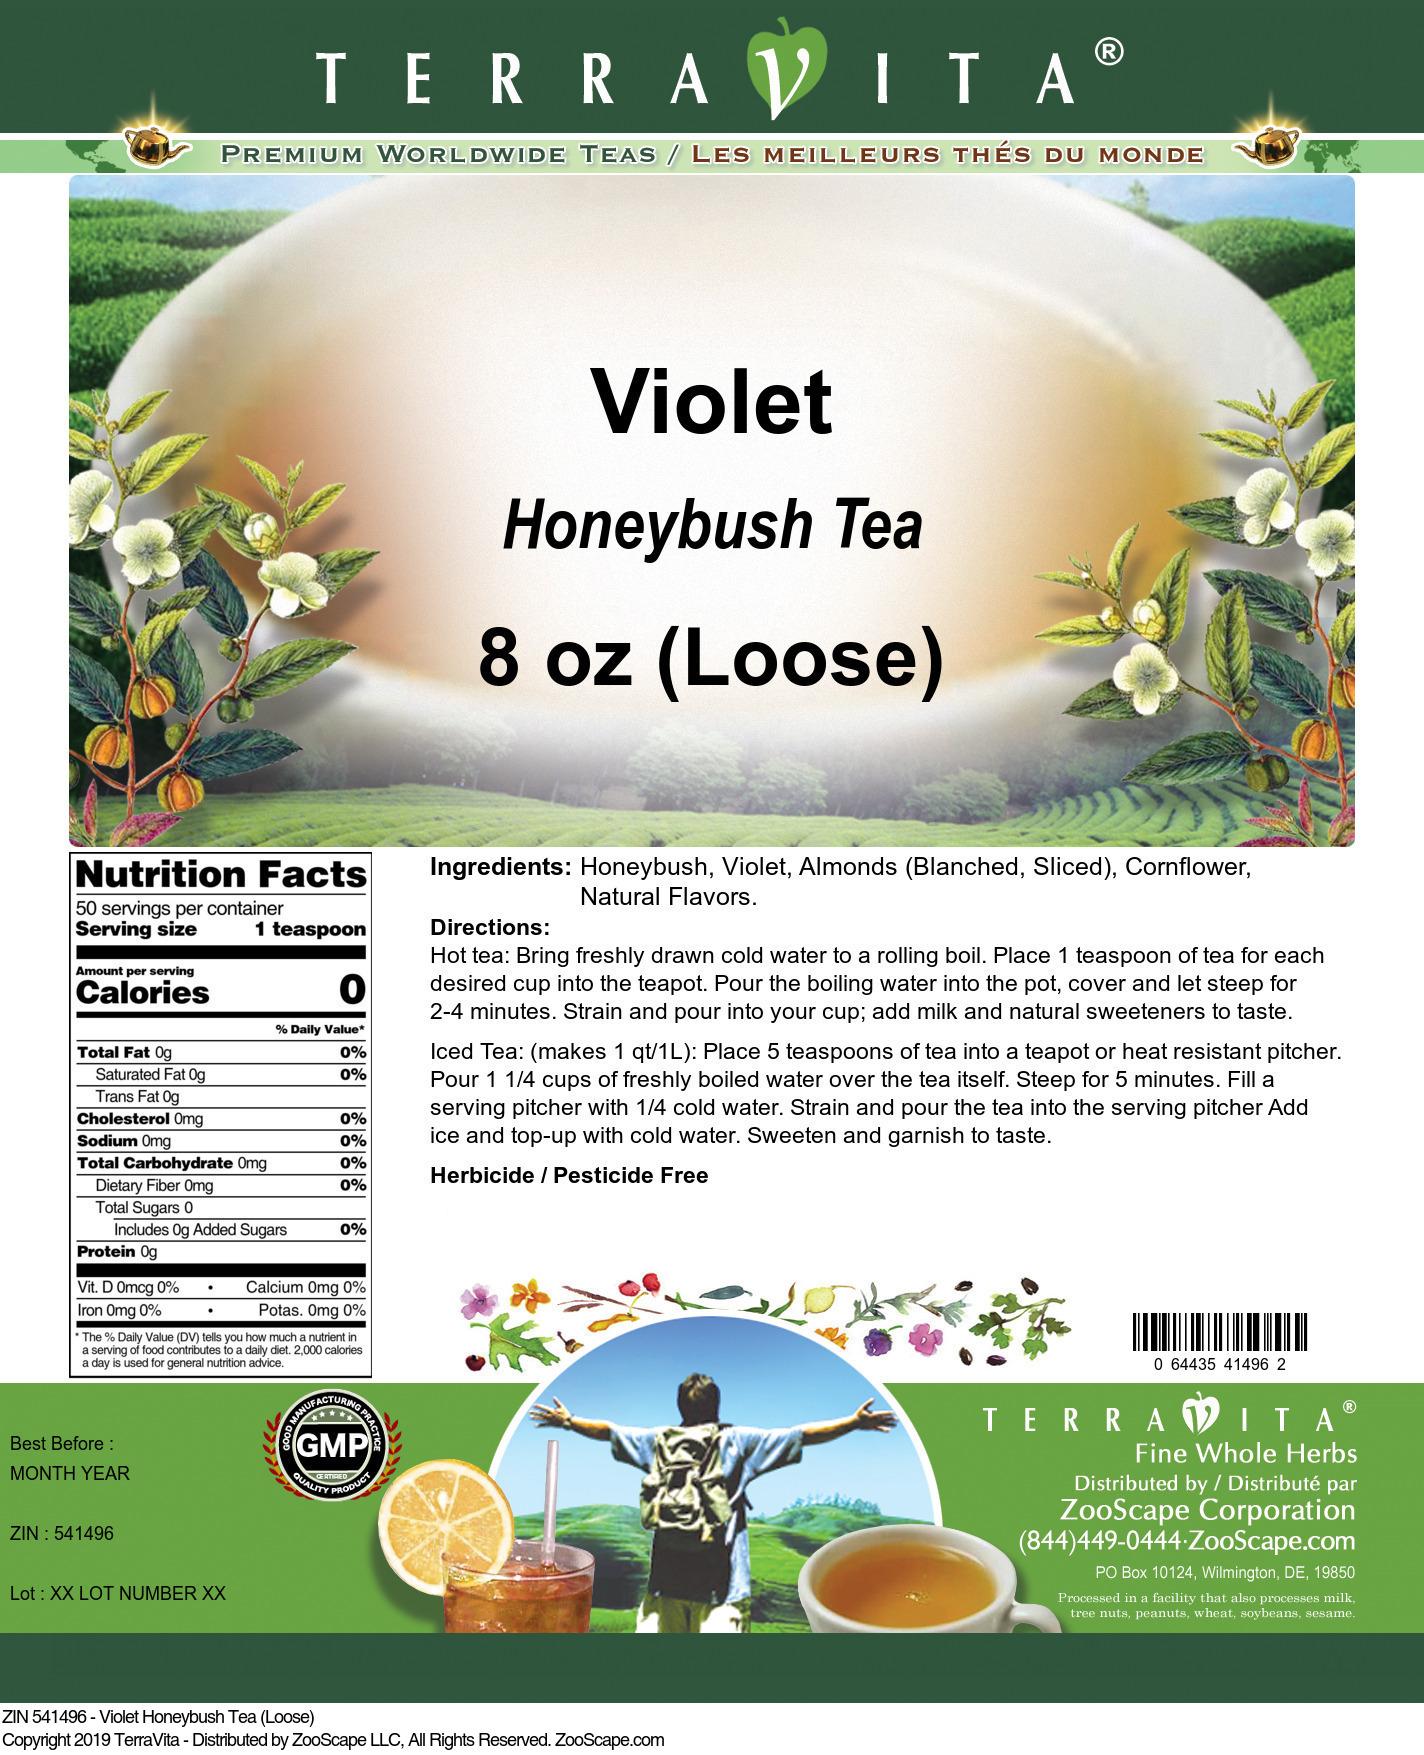 Violet Honeybush Tea (Loose)